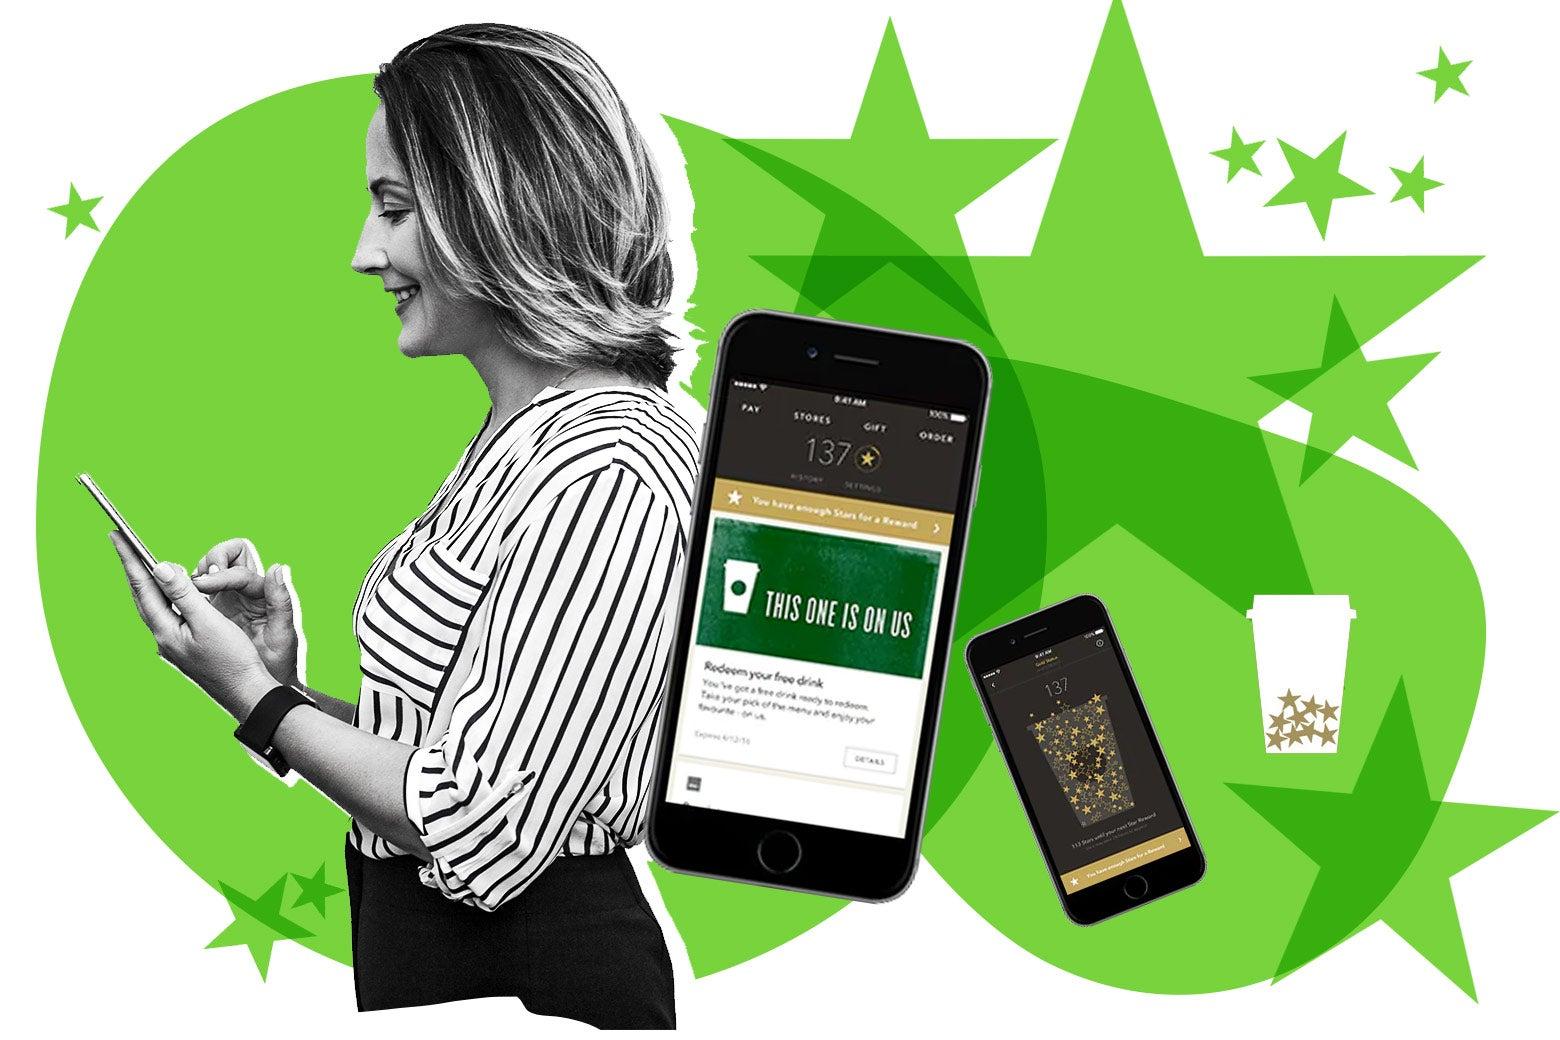 Woman on her phone, Starbucks app screenshots